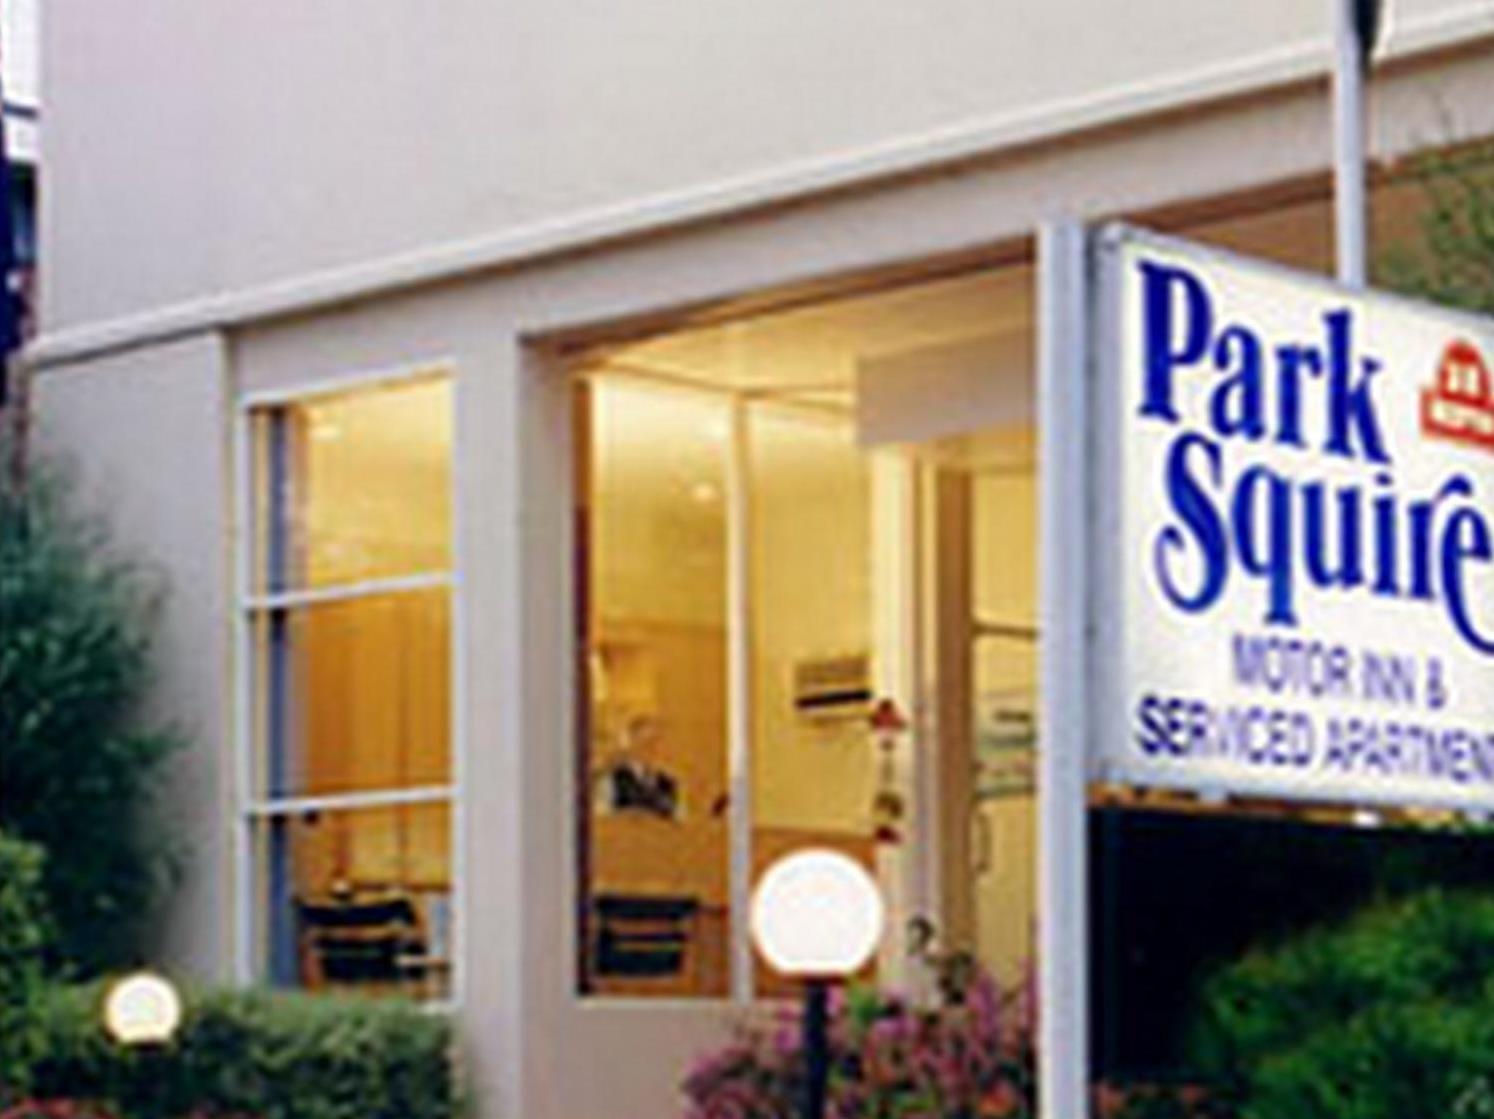 Park Squire Motor Inn and Serviced Apartment - Hotell och Boende i Australien , Melbourne